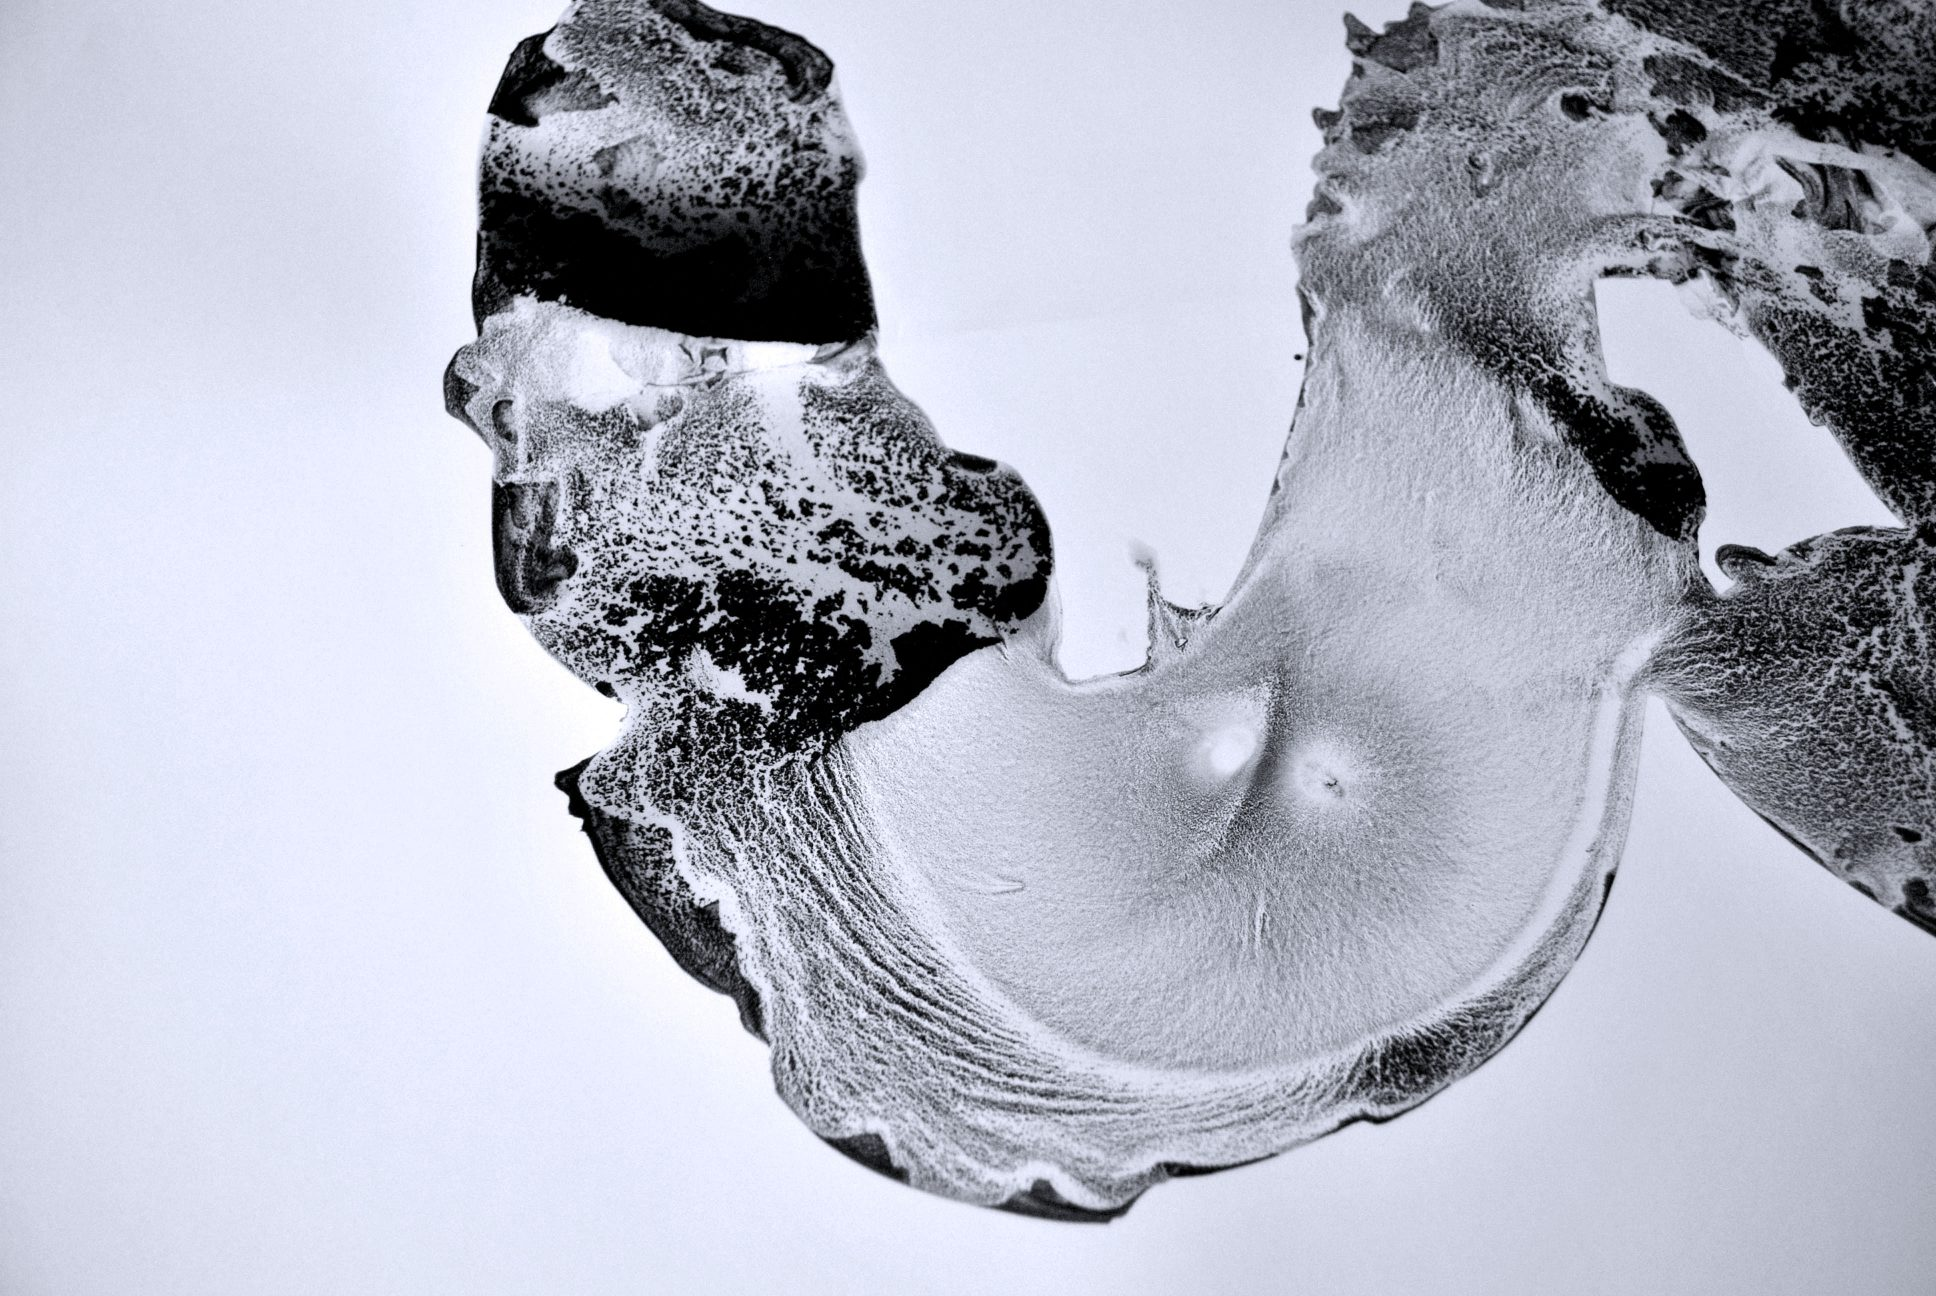 Japanese artwork series - monoqrome.co